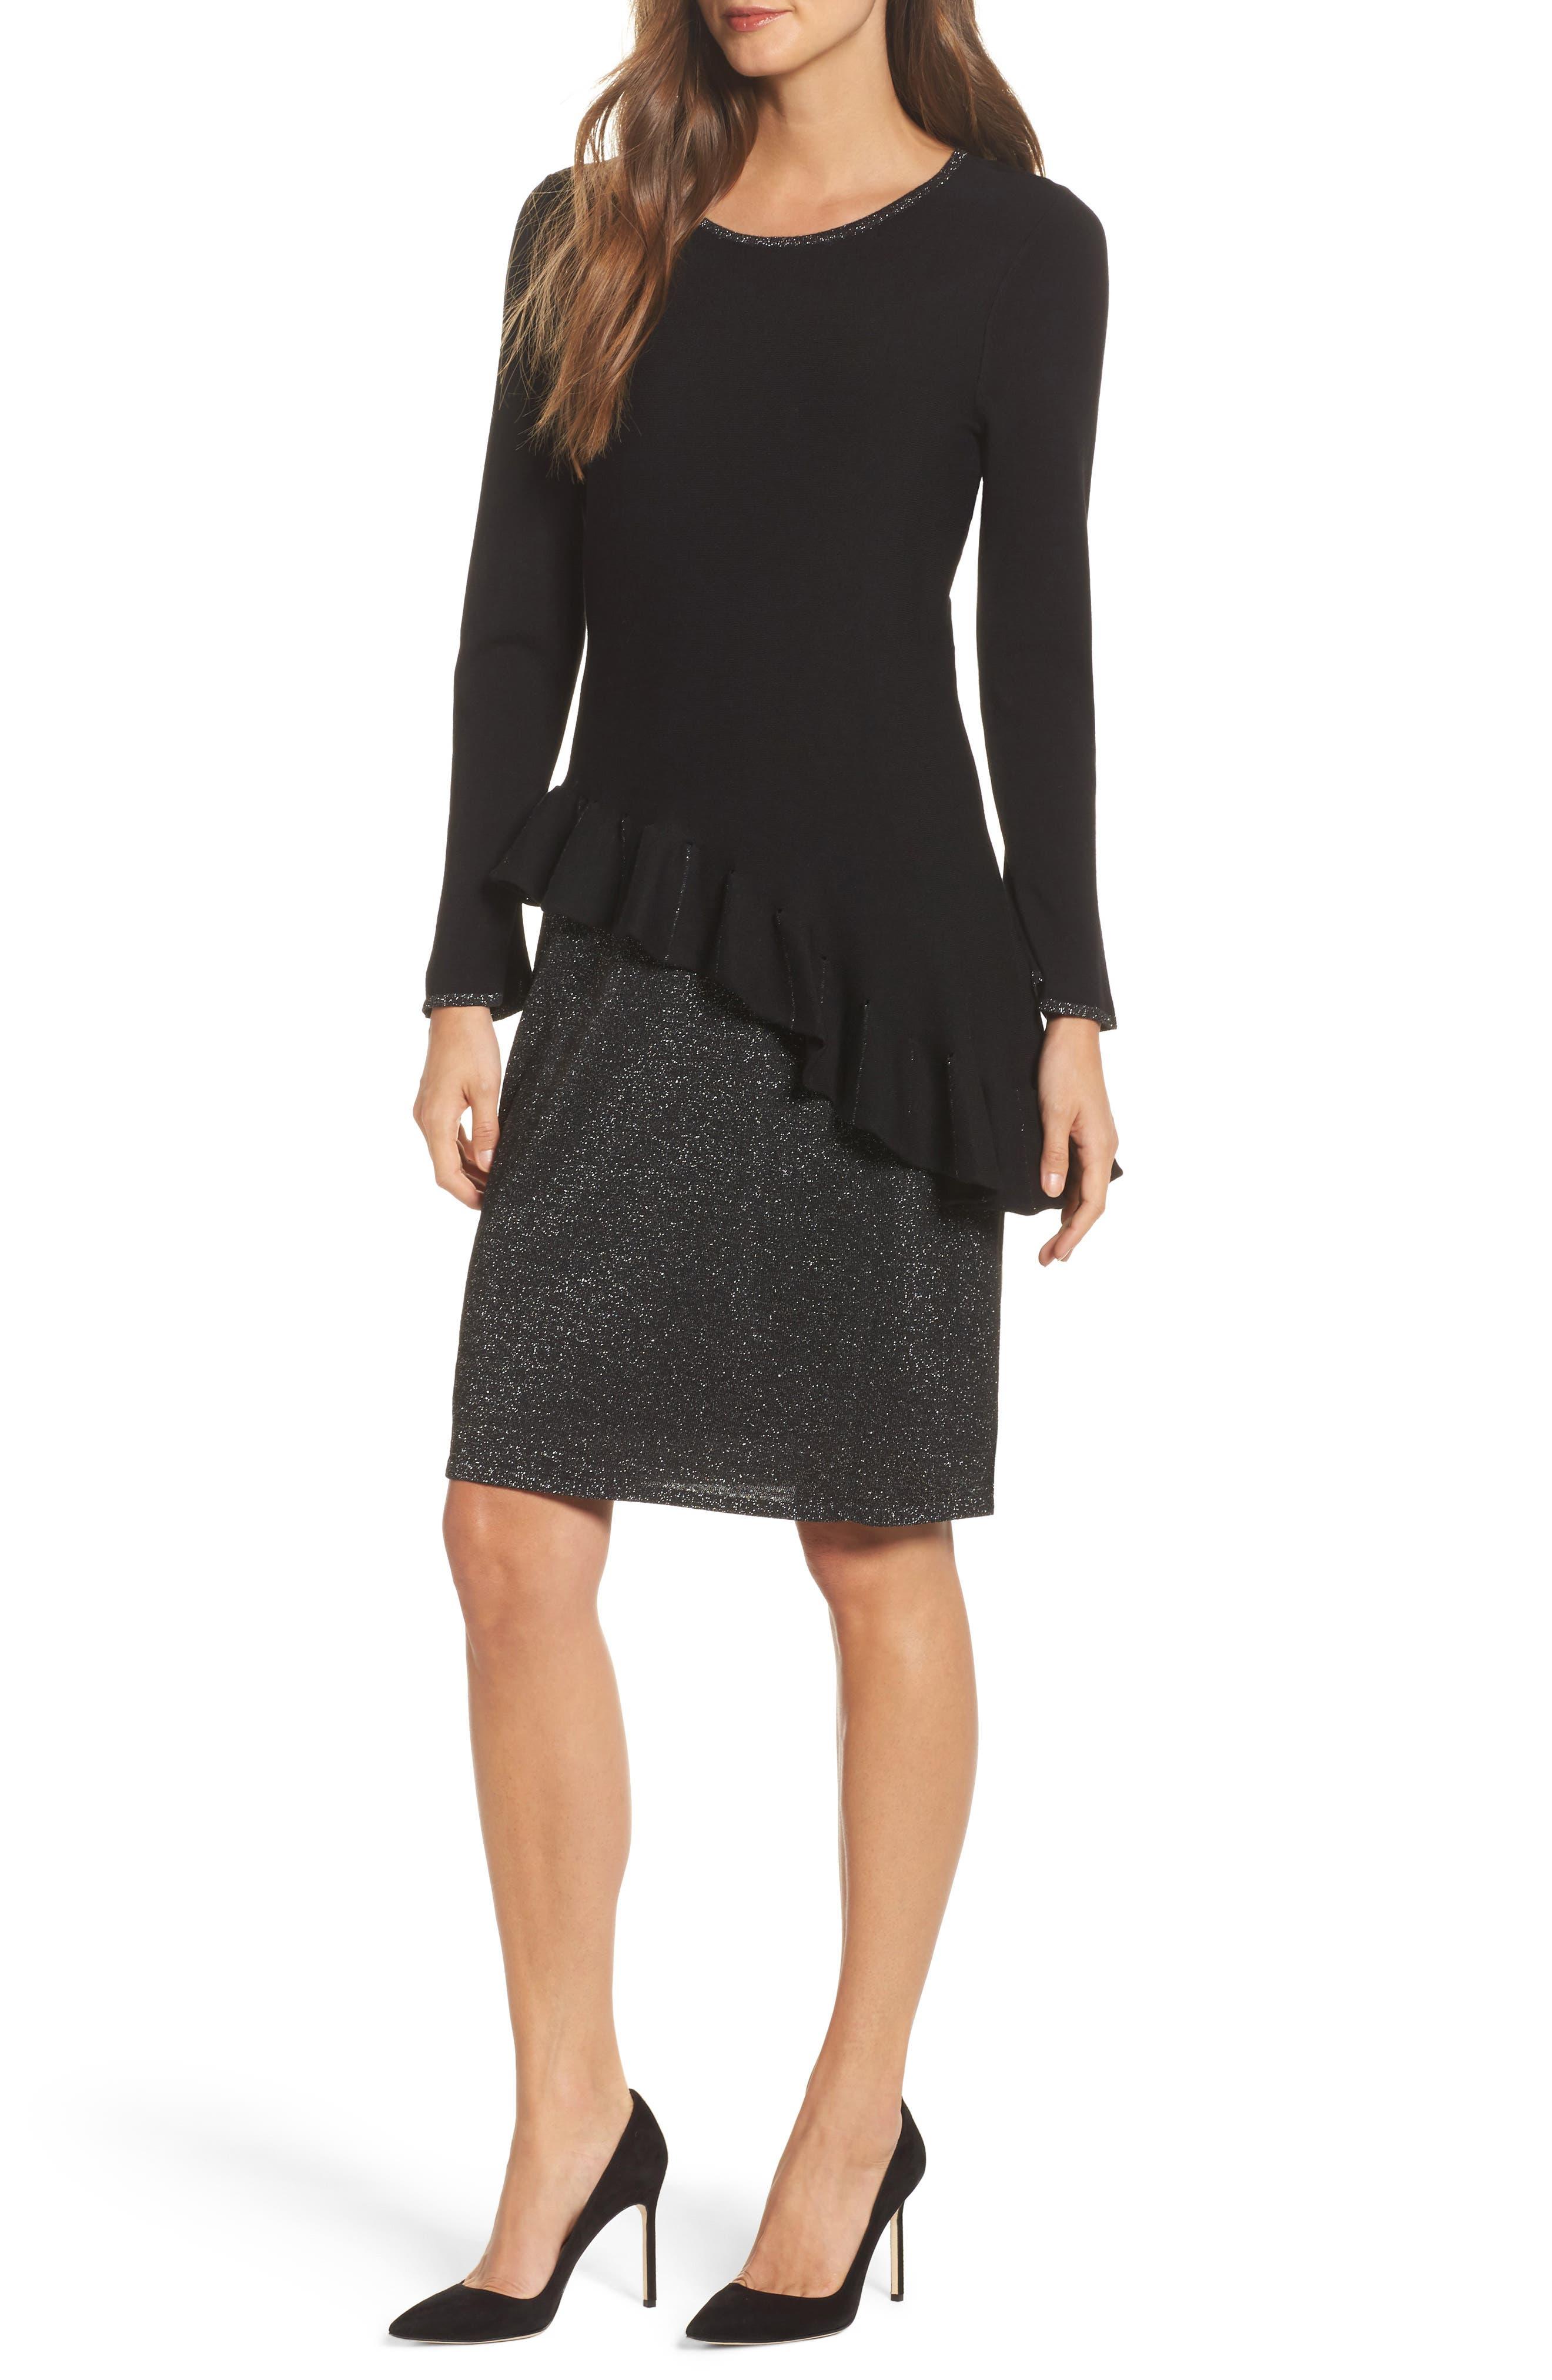 Ruffled Up Two-Piece Dress,                             Main thumbnail 1, color,                             004